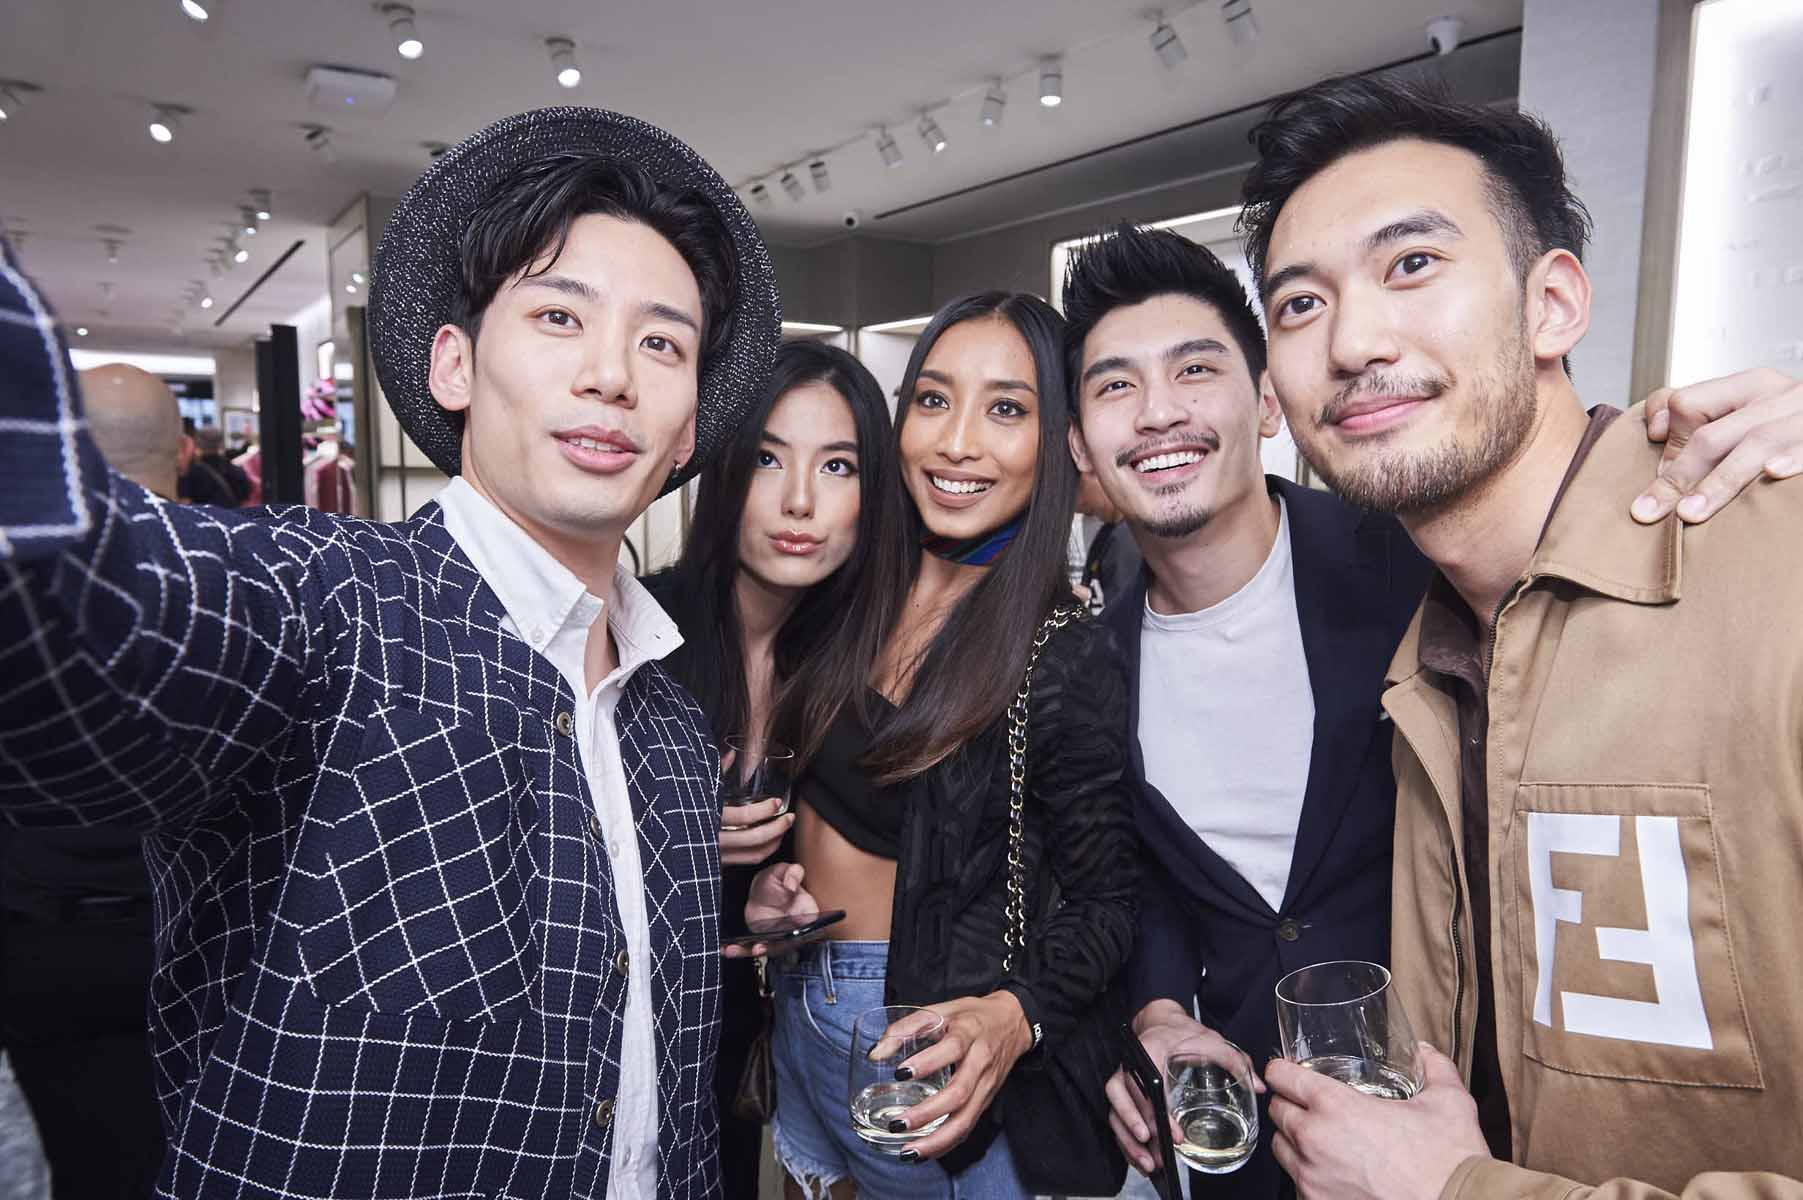 Nick Tjoa, Natalia Yen, Jona Mae, Robin Tiang, Alexander Yue